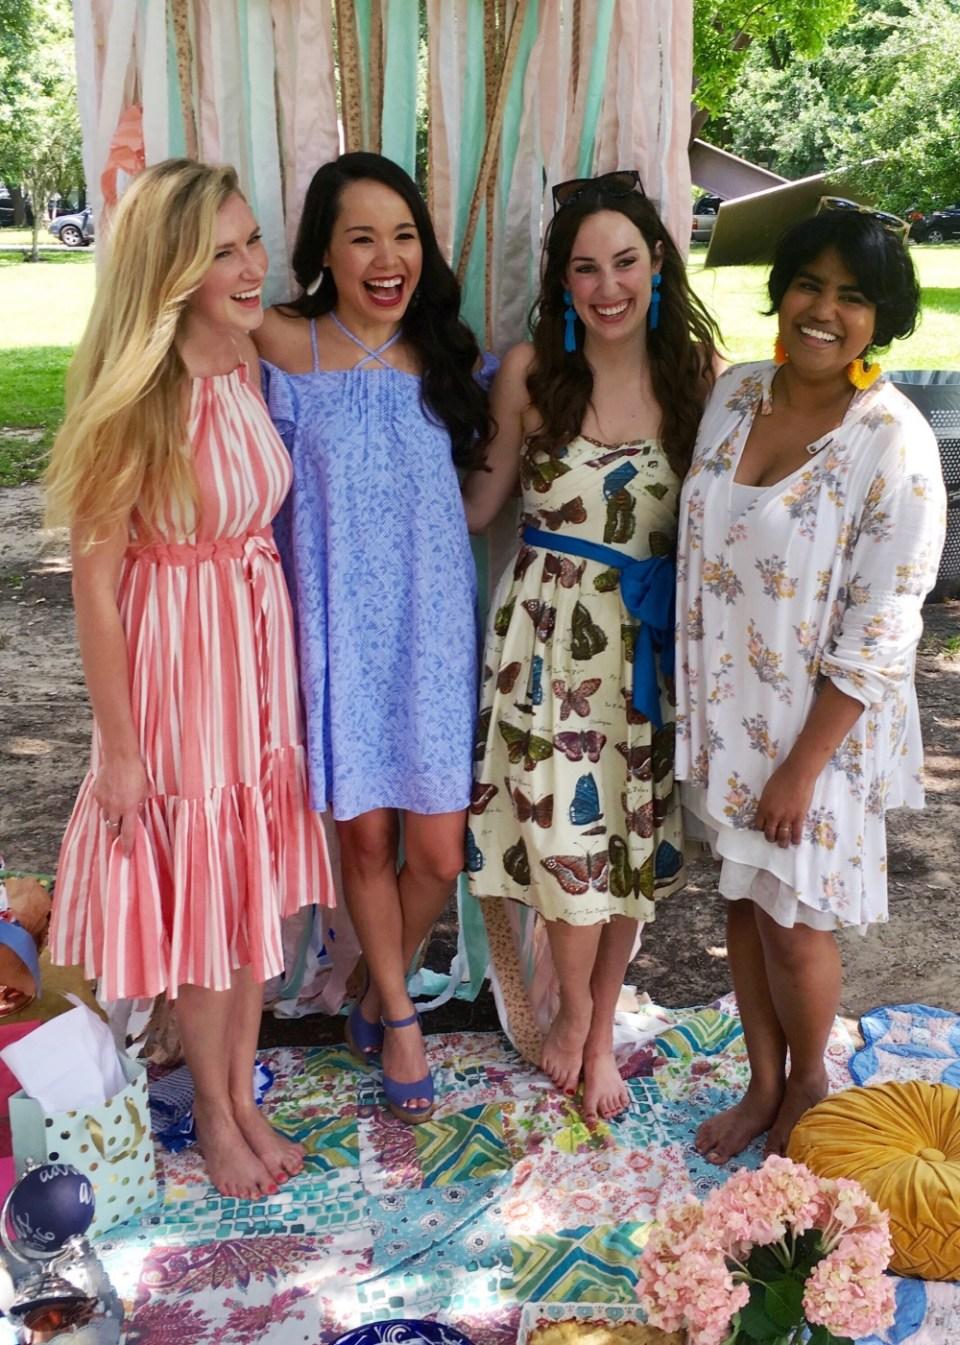 anthropologie butterfly dress, anthropologie picnic, picnic bridal shower, menil park picnic bridal shower